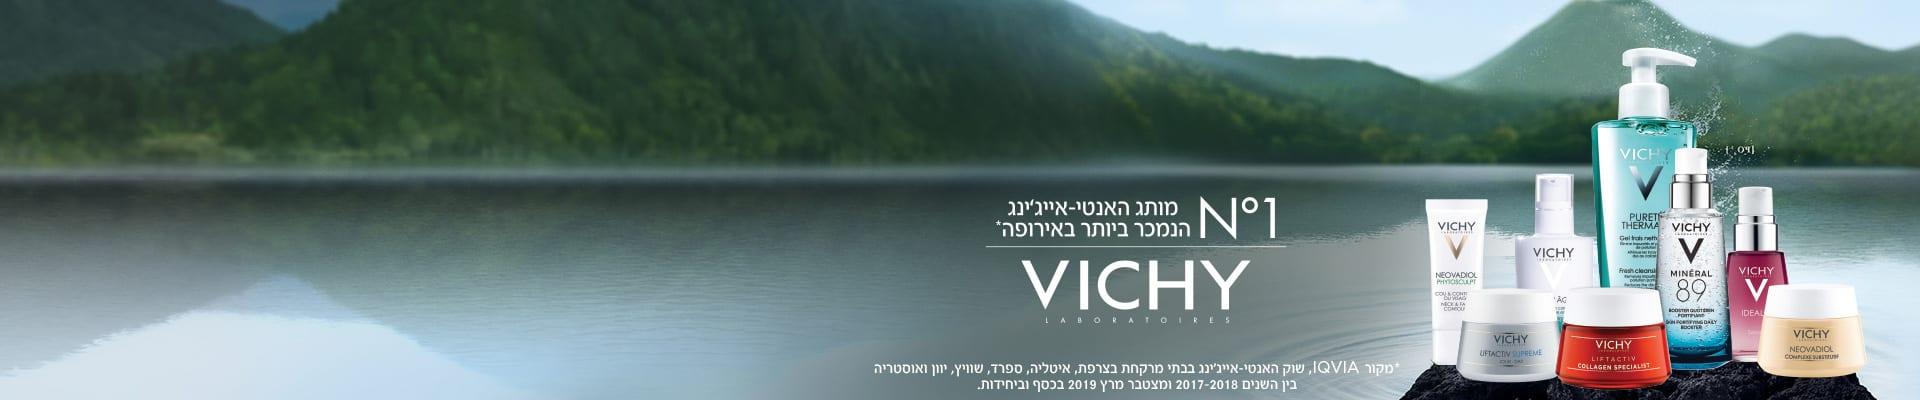 vichy_shufersal_1920_400.jpg